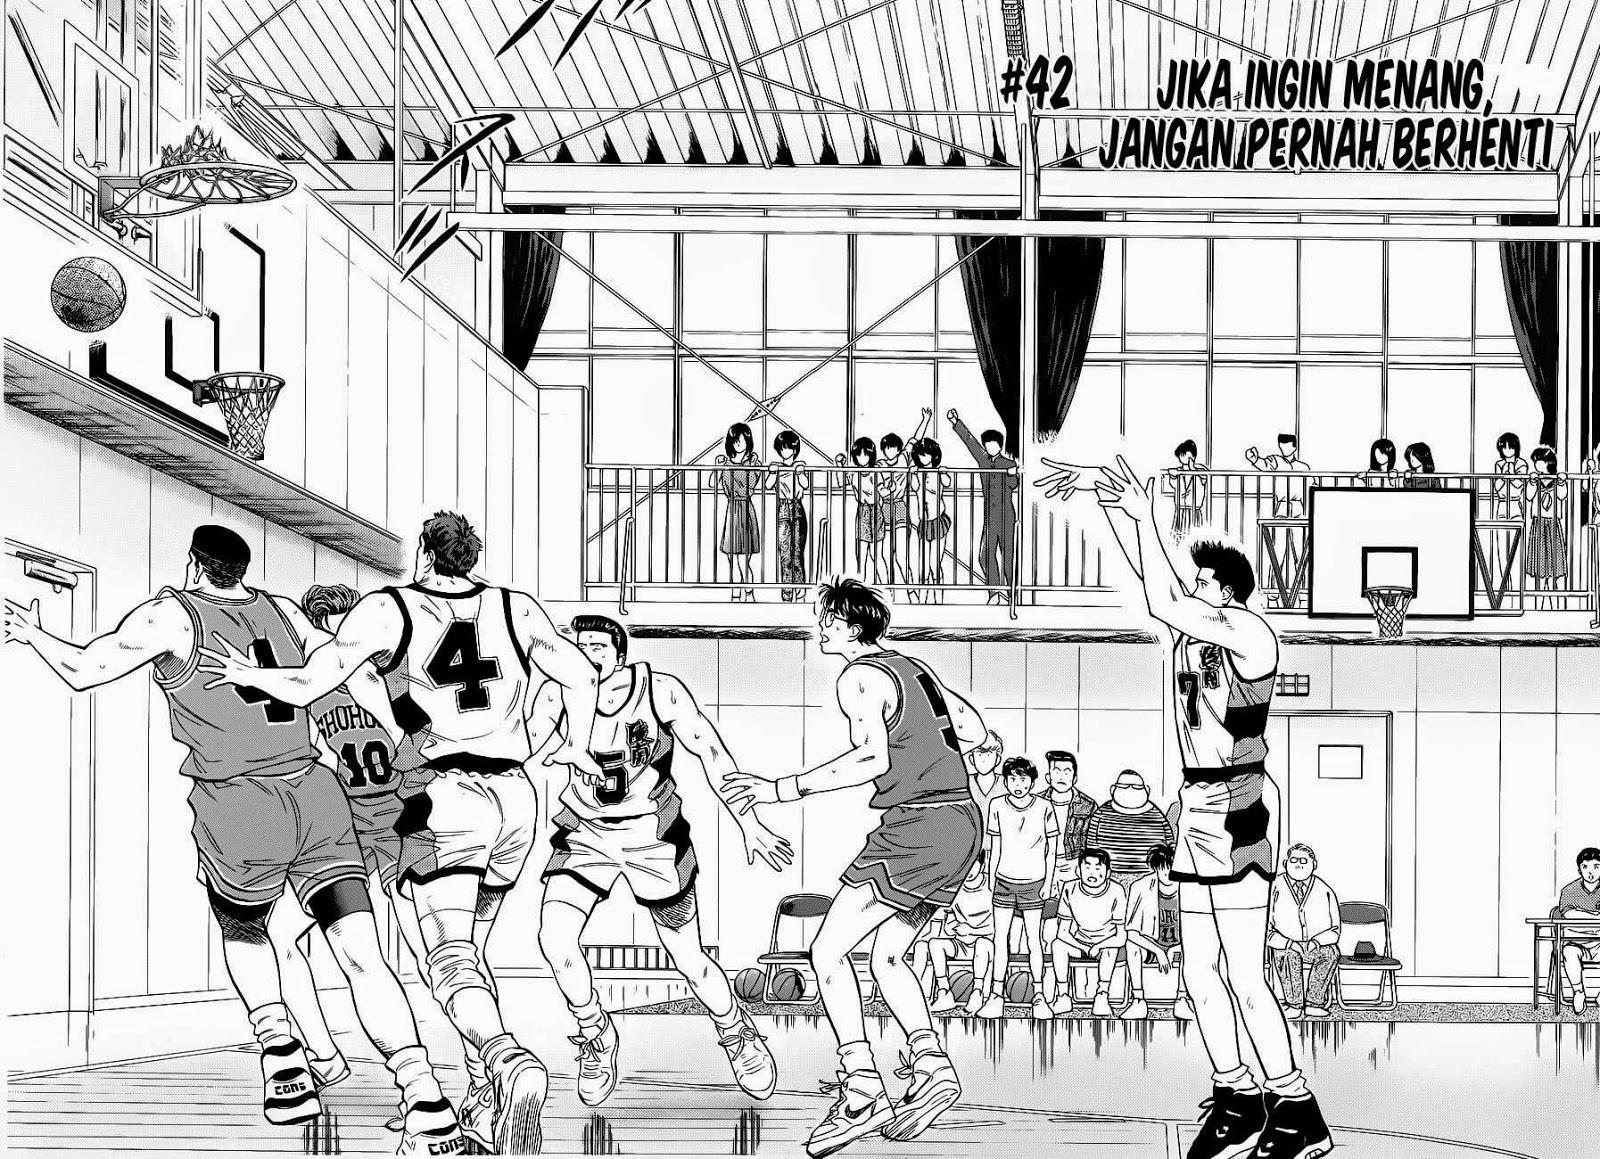 Komik slam dunk 042 - jika ingin menang jangan pernah berhenti 43 Indonesia slam dunk 042 - jika ingin menang jangan pernah berhenti Terbaru 2|Baca Manga Komik Indonesia|